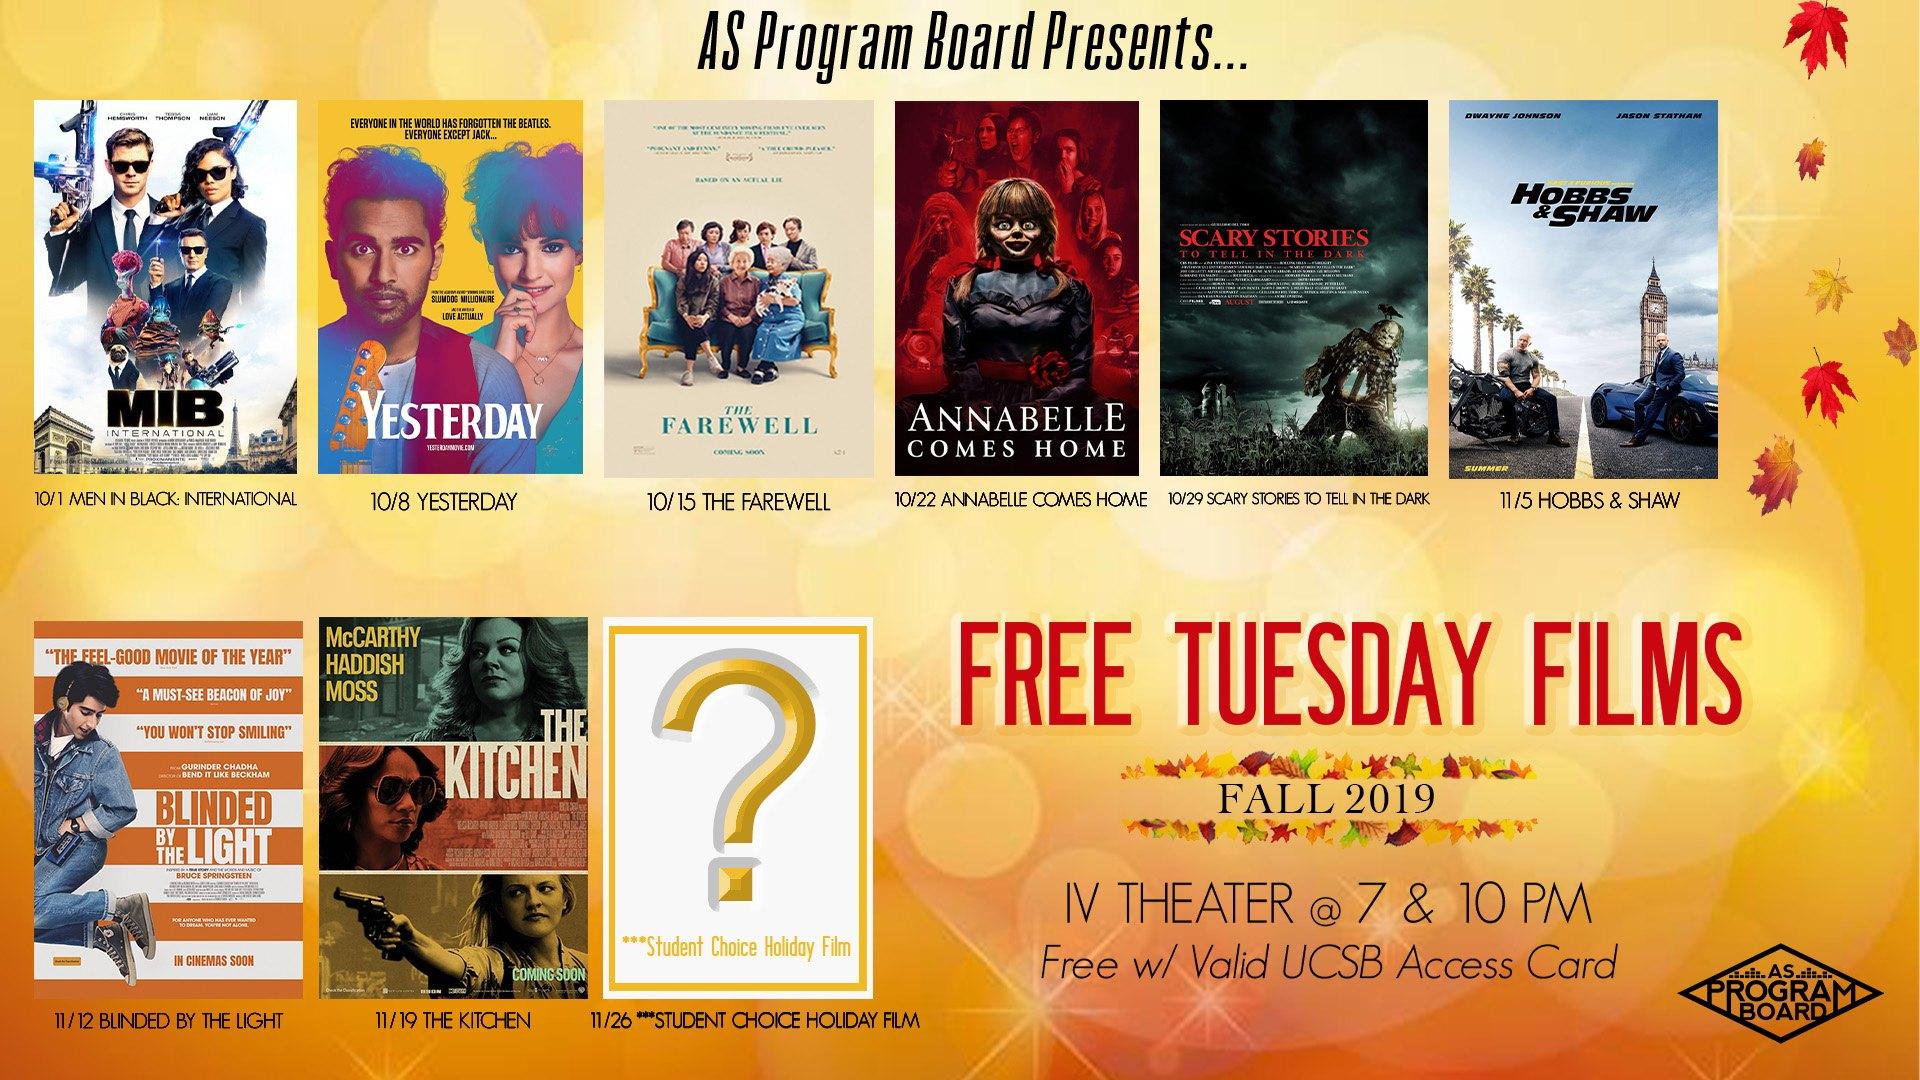 Free Tuesday Films Fall 2019